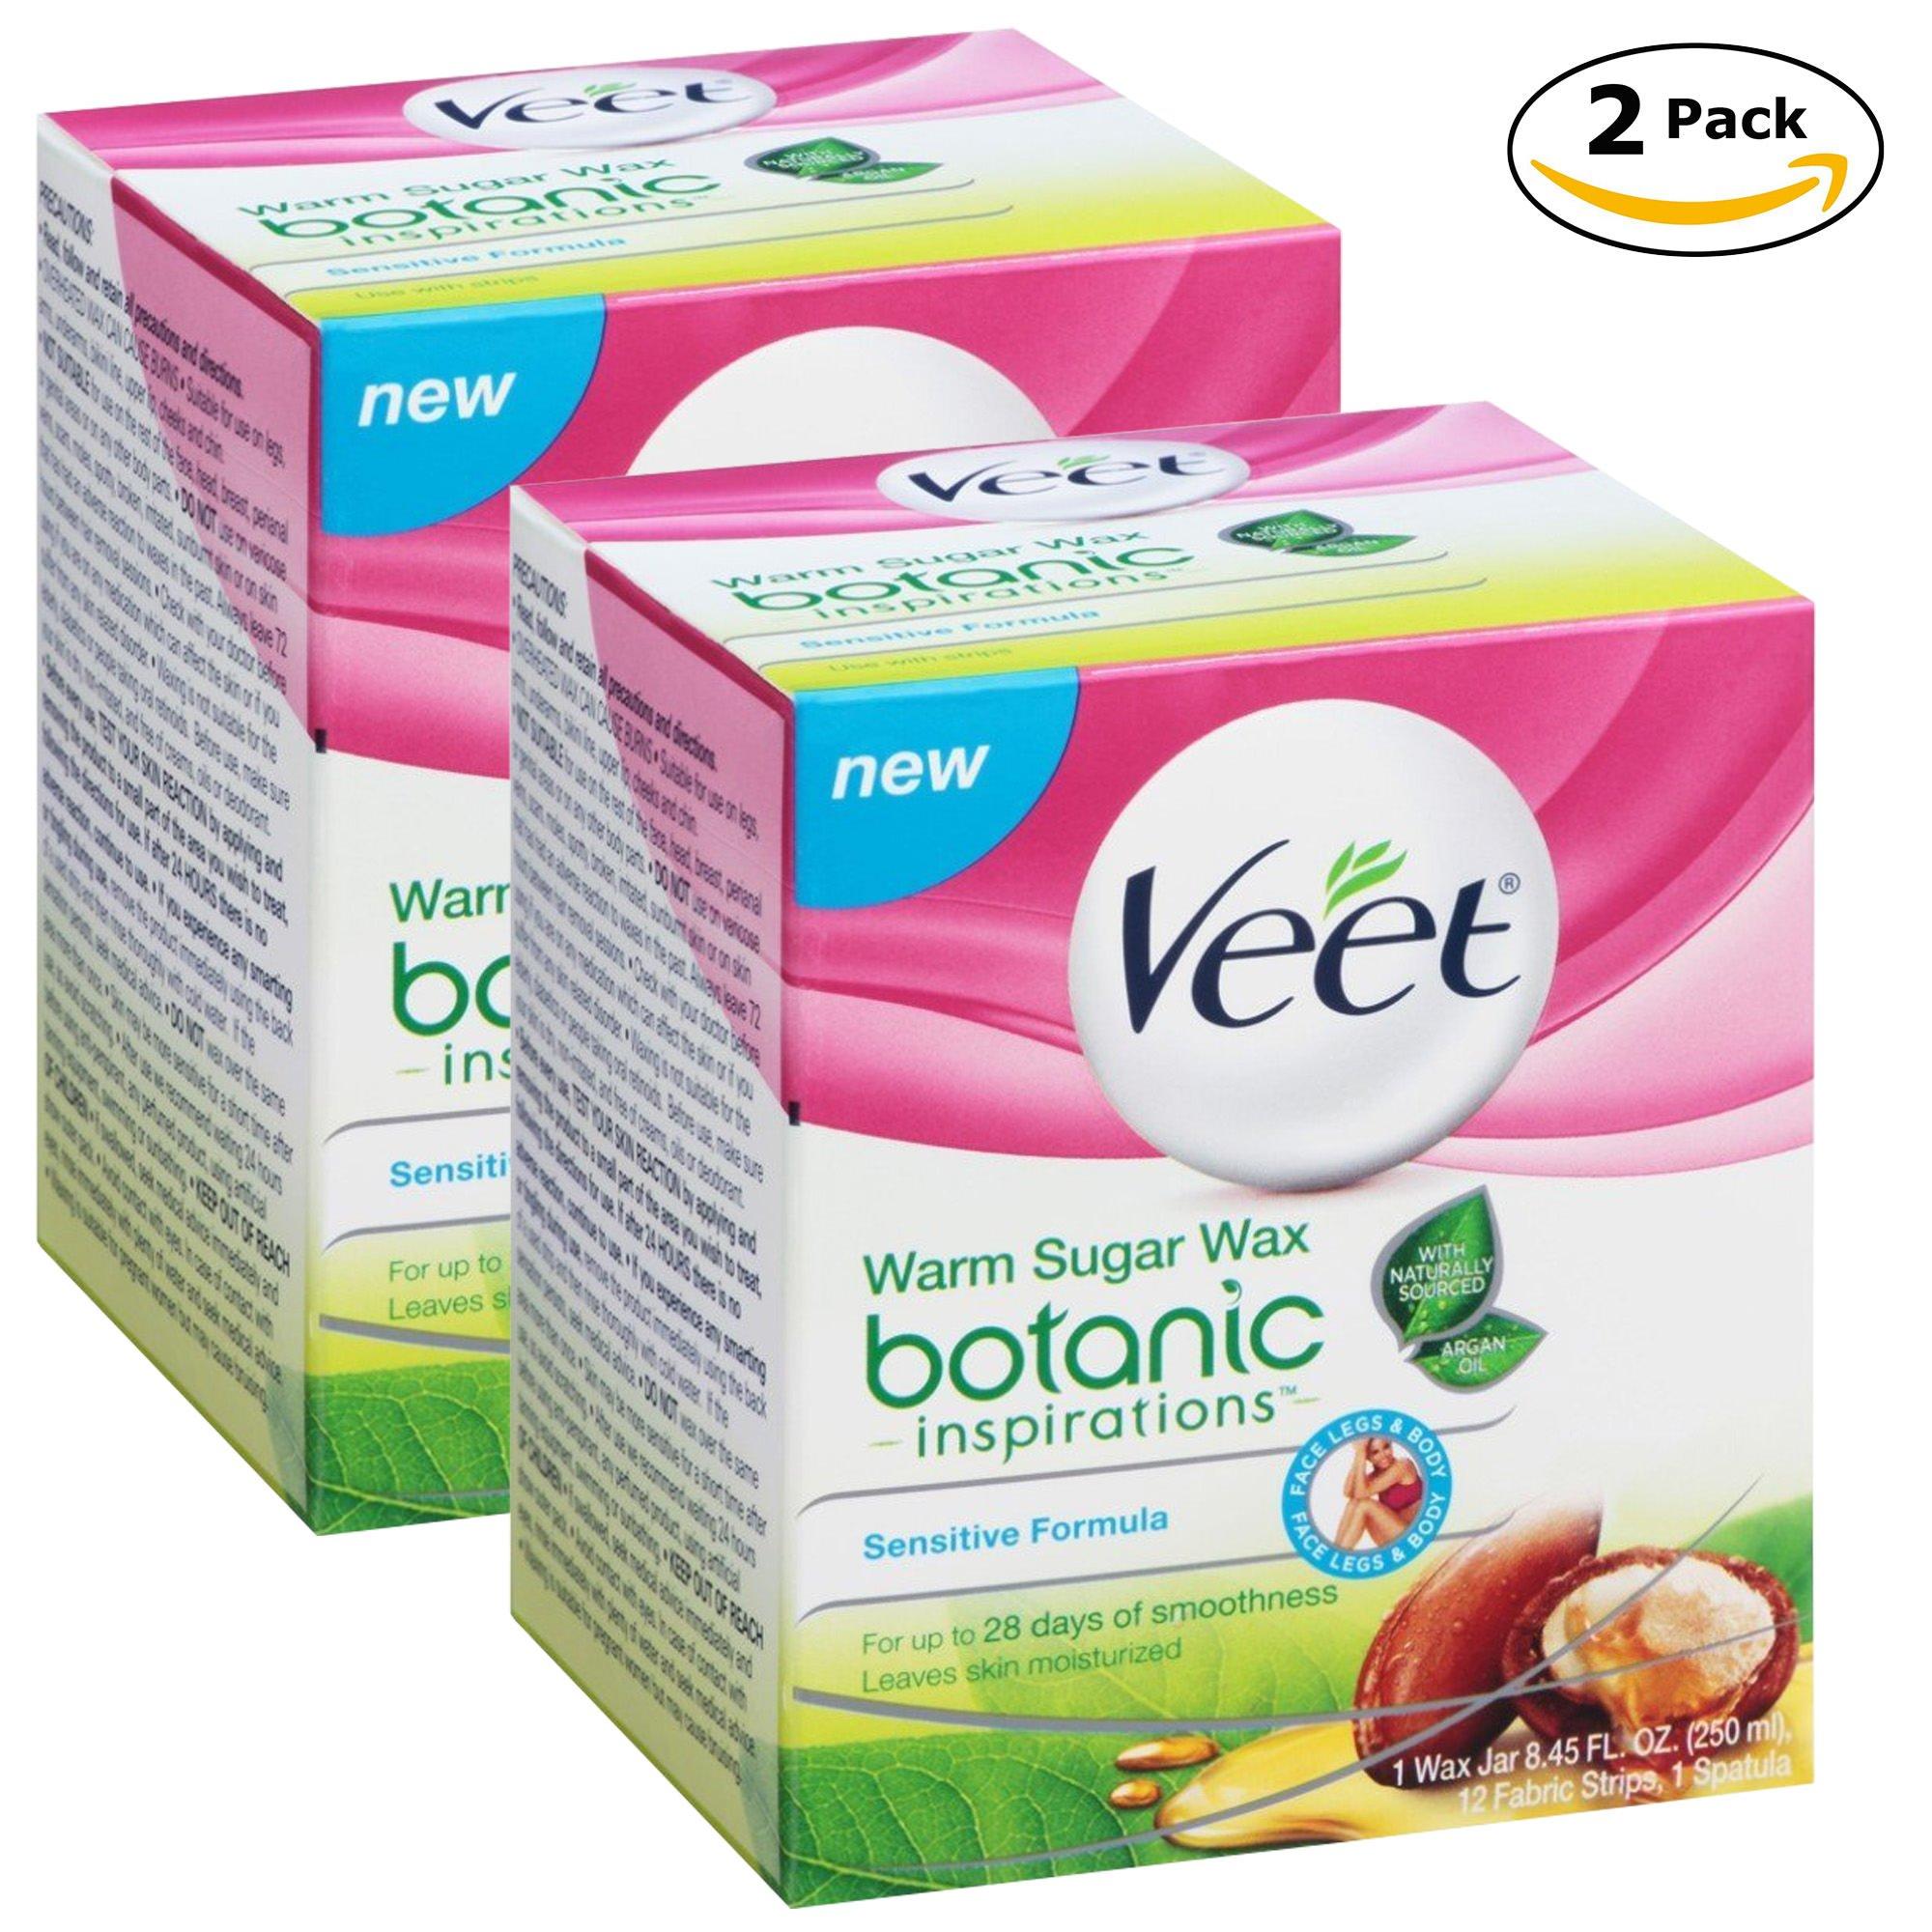 Veet Botanic Warm Sugar Wax Jar 8.45oz (Sensitive) (2 Pack)